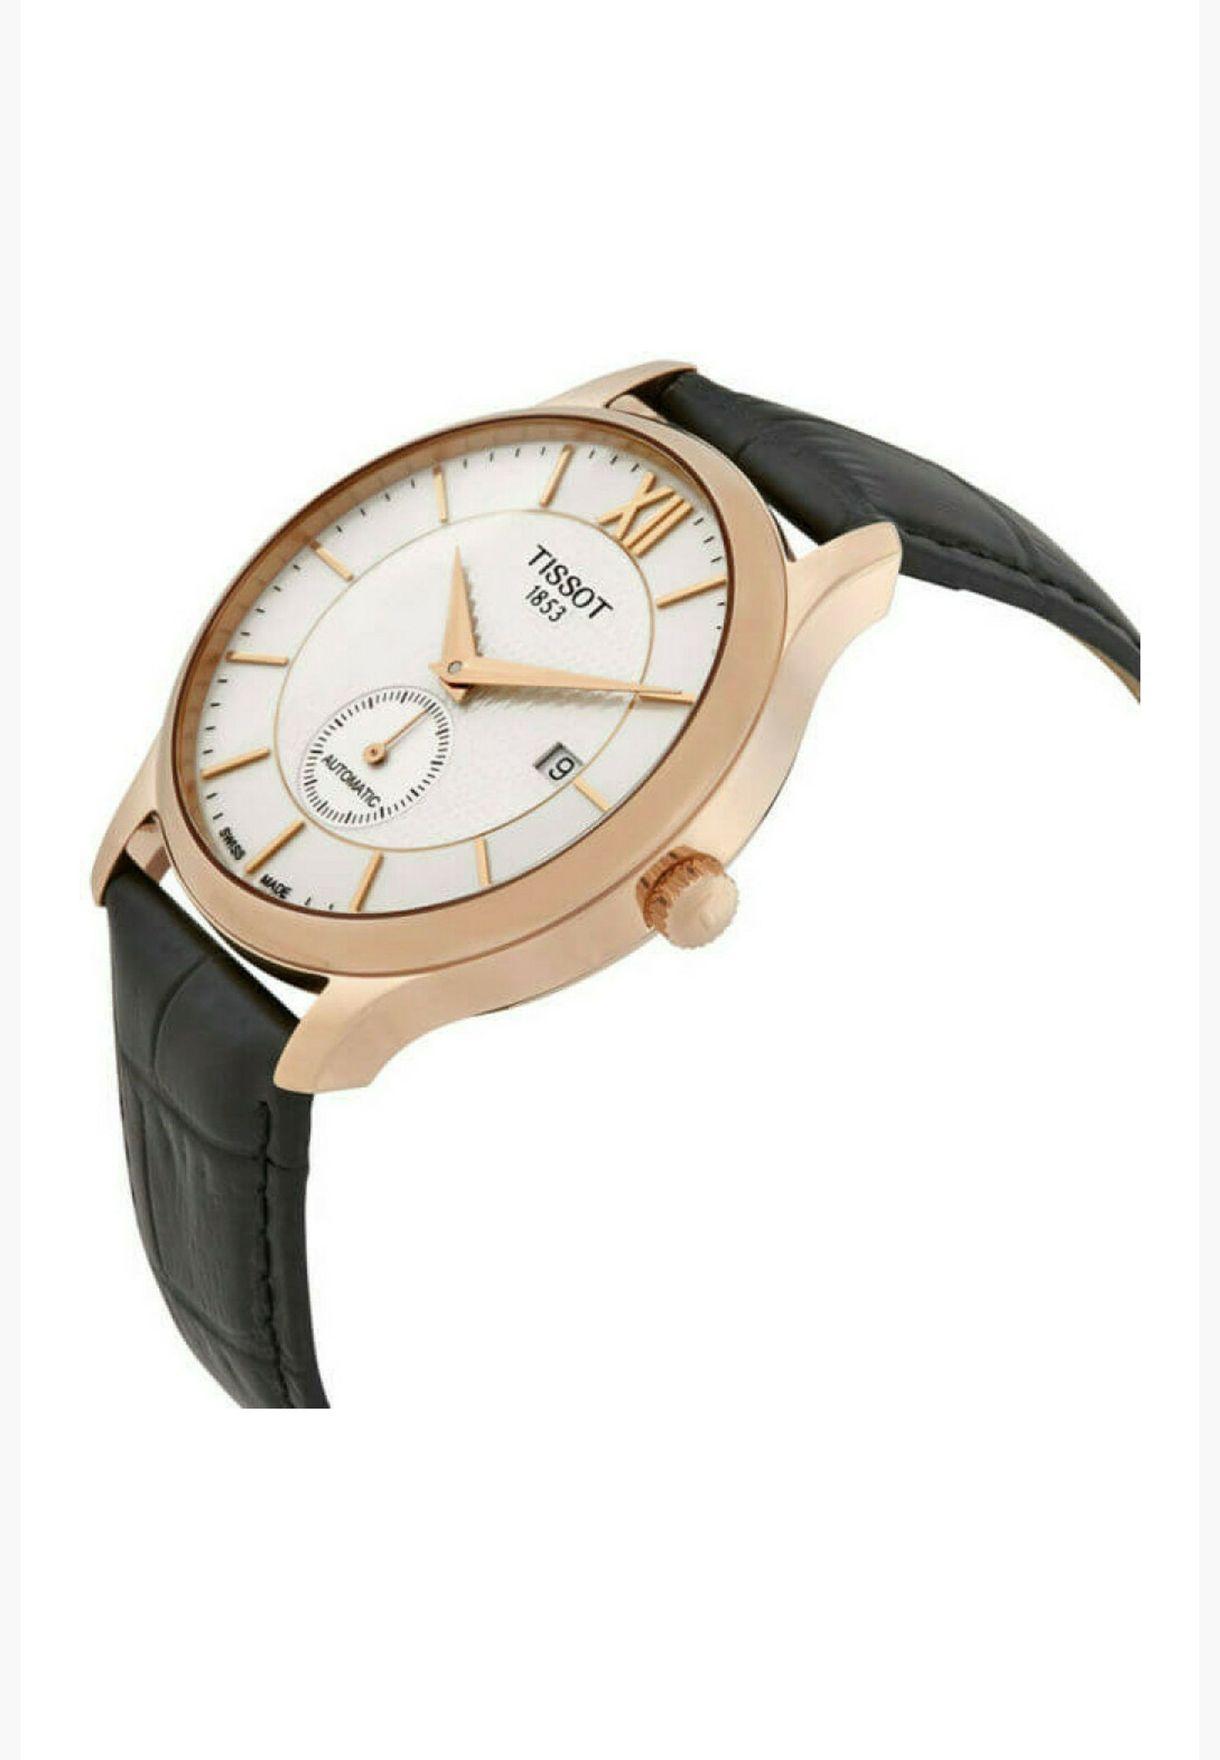 ساعة تيسو تراديشين بسوار جلدي - T063.428.36.038.00